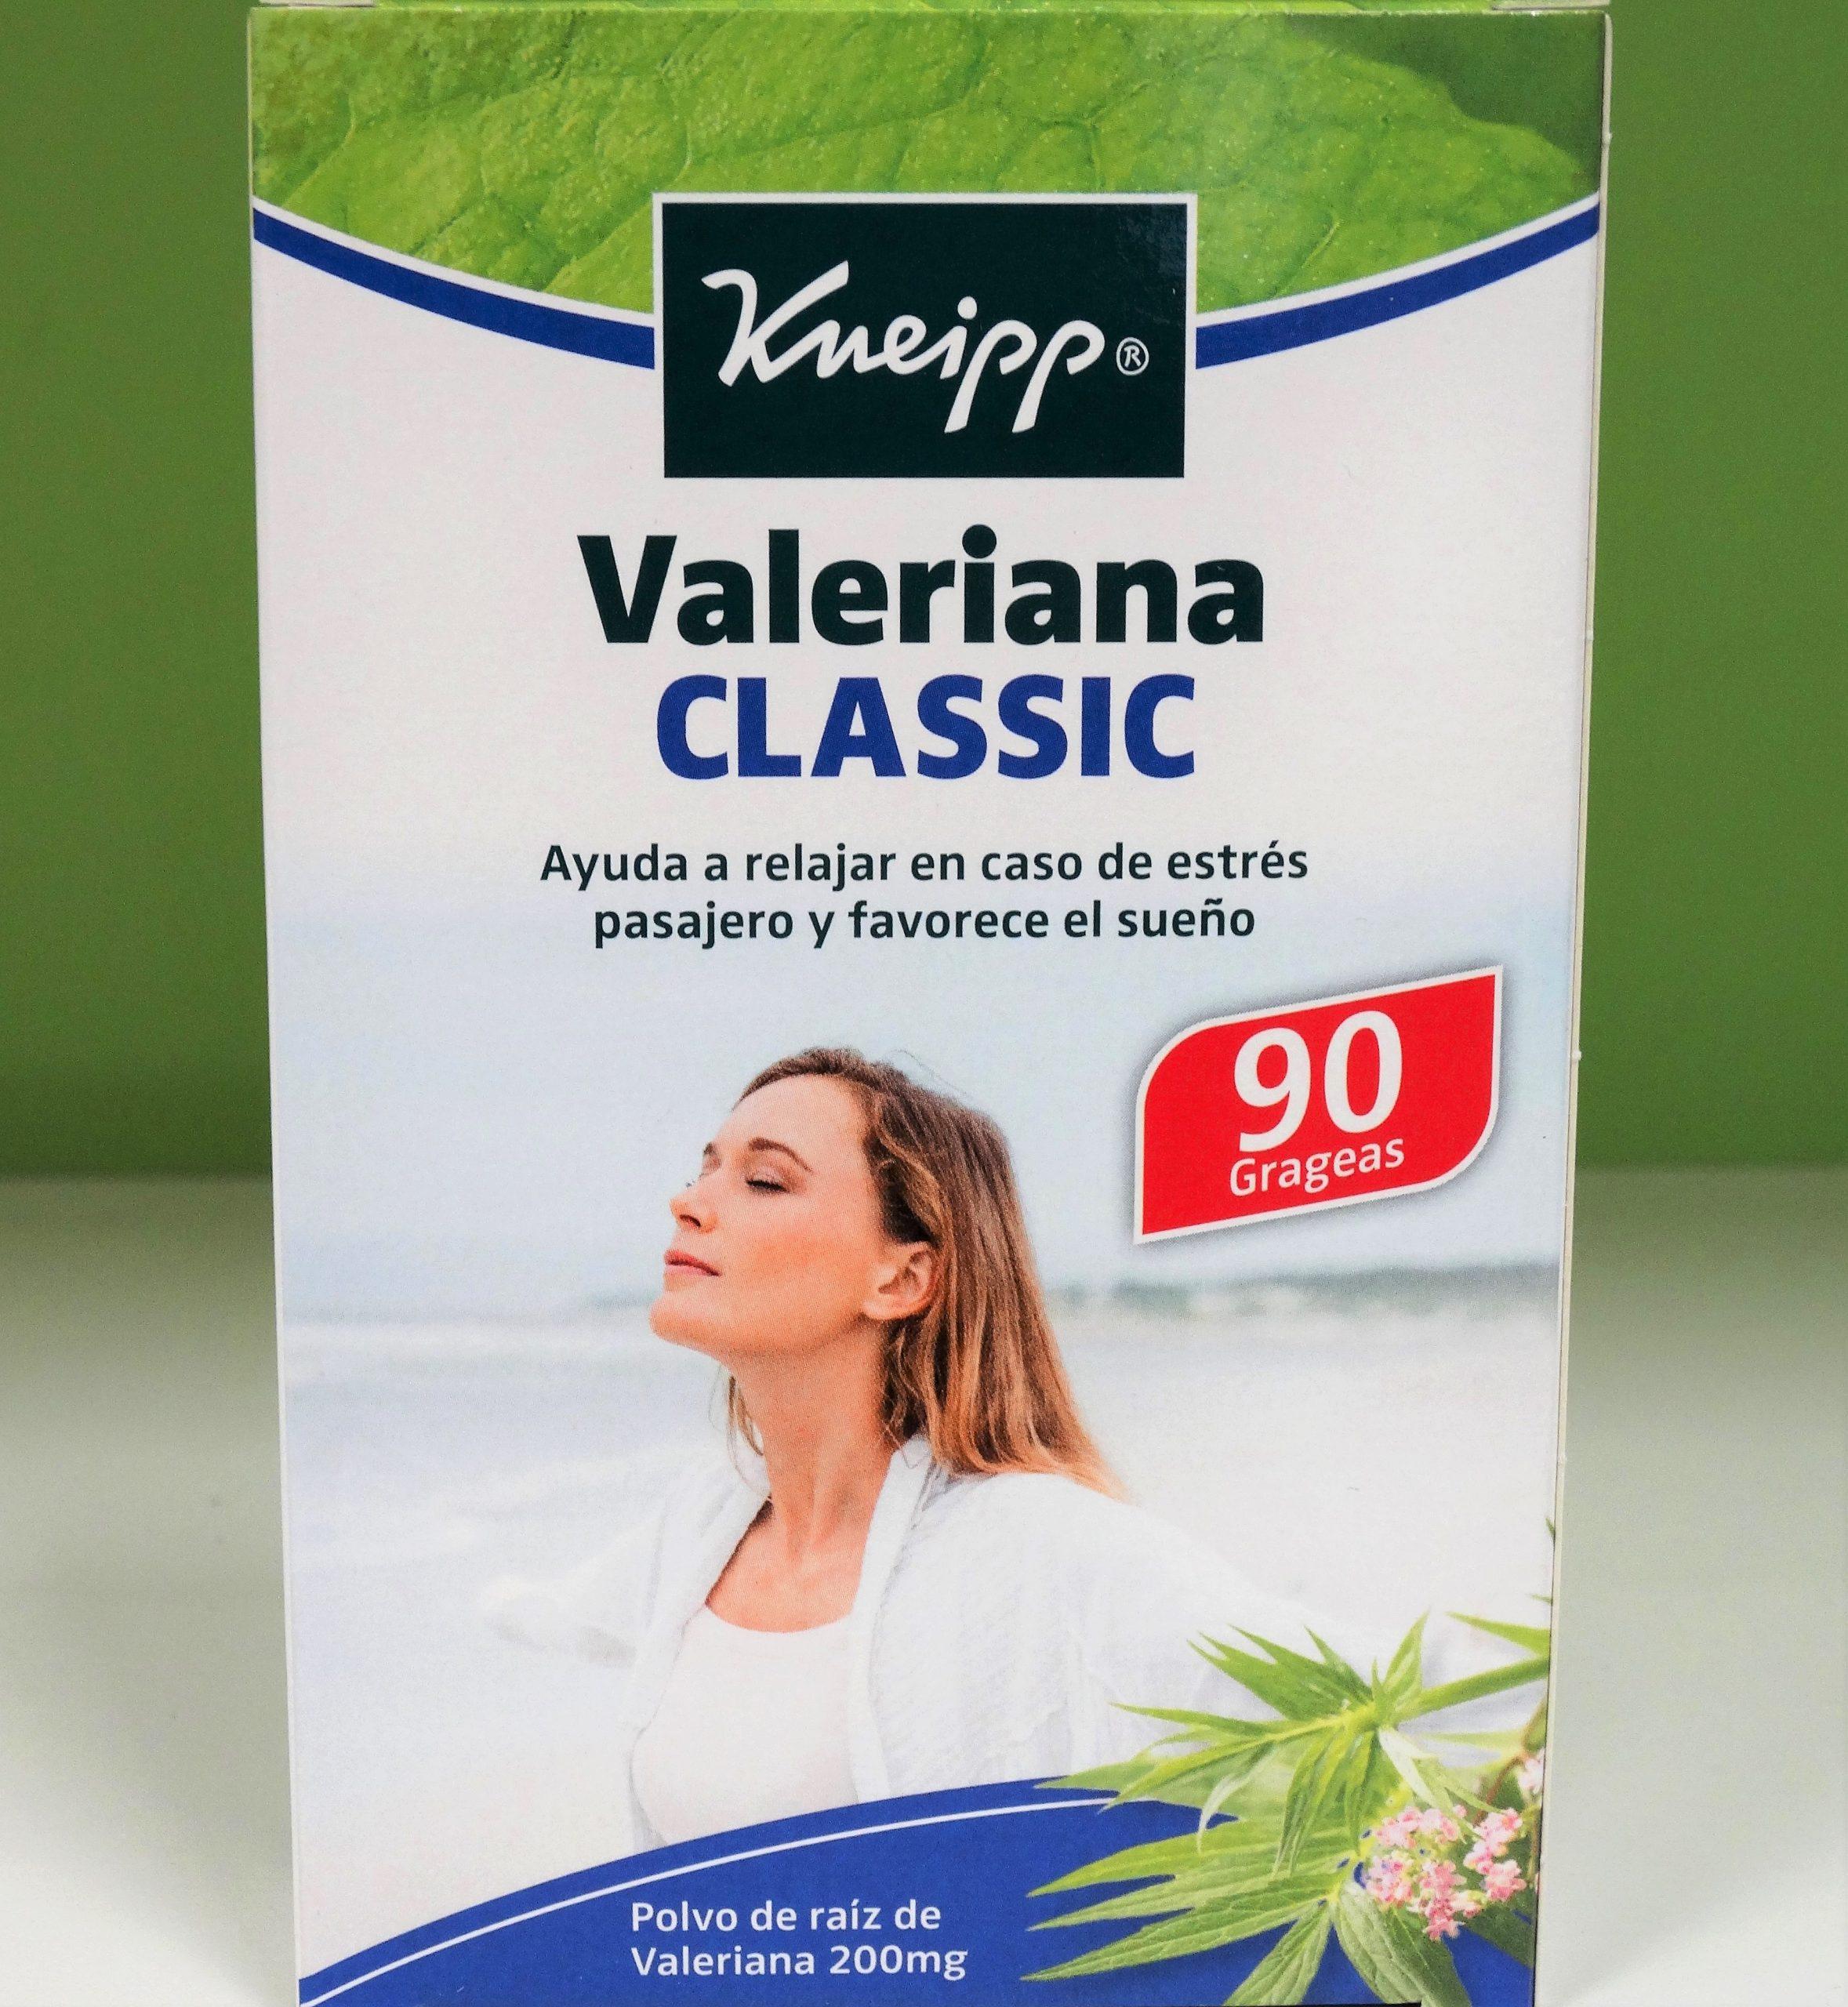 Kneipp Valeriana Classic 90 Grageasnerviosismo y el estrés